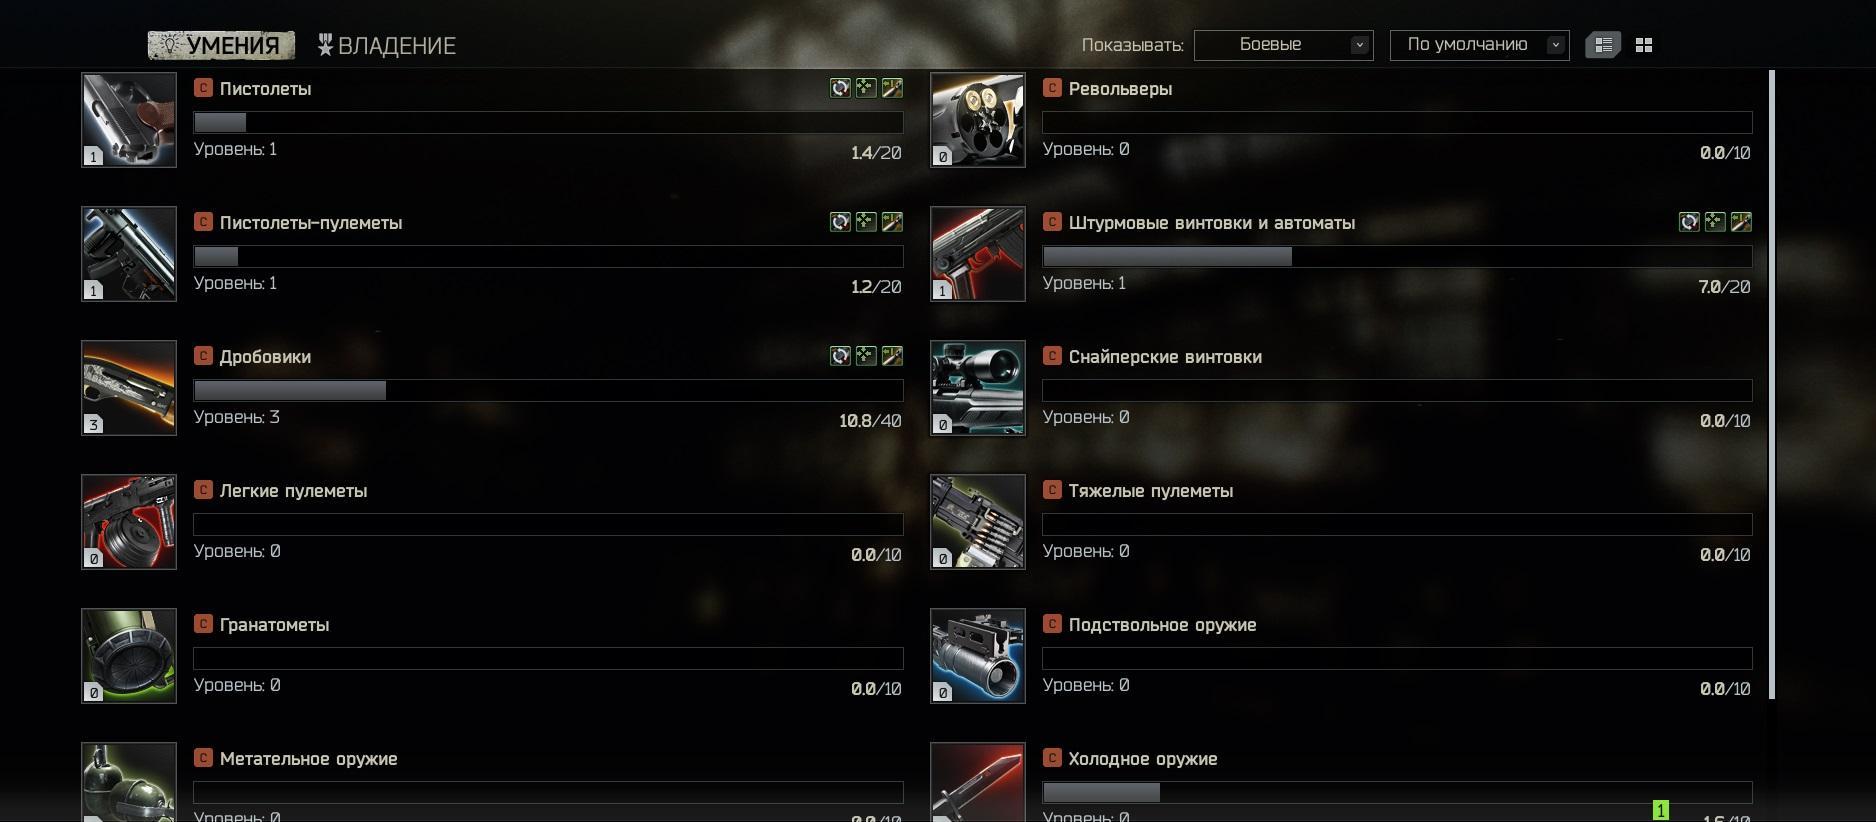 C - боевые Escape from Tarkov навыки и умения